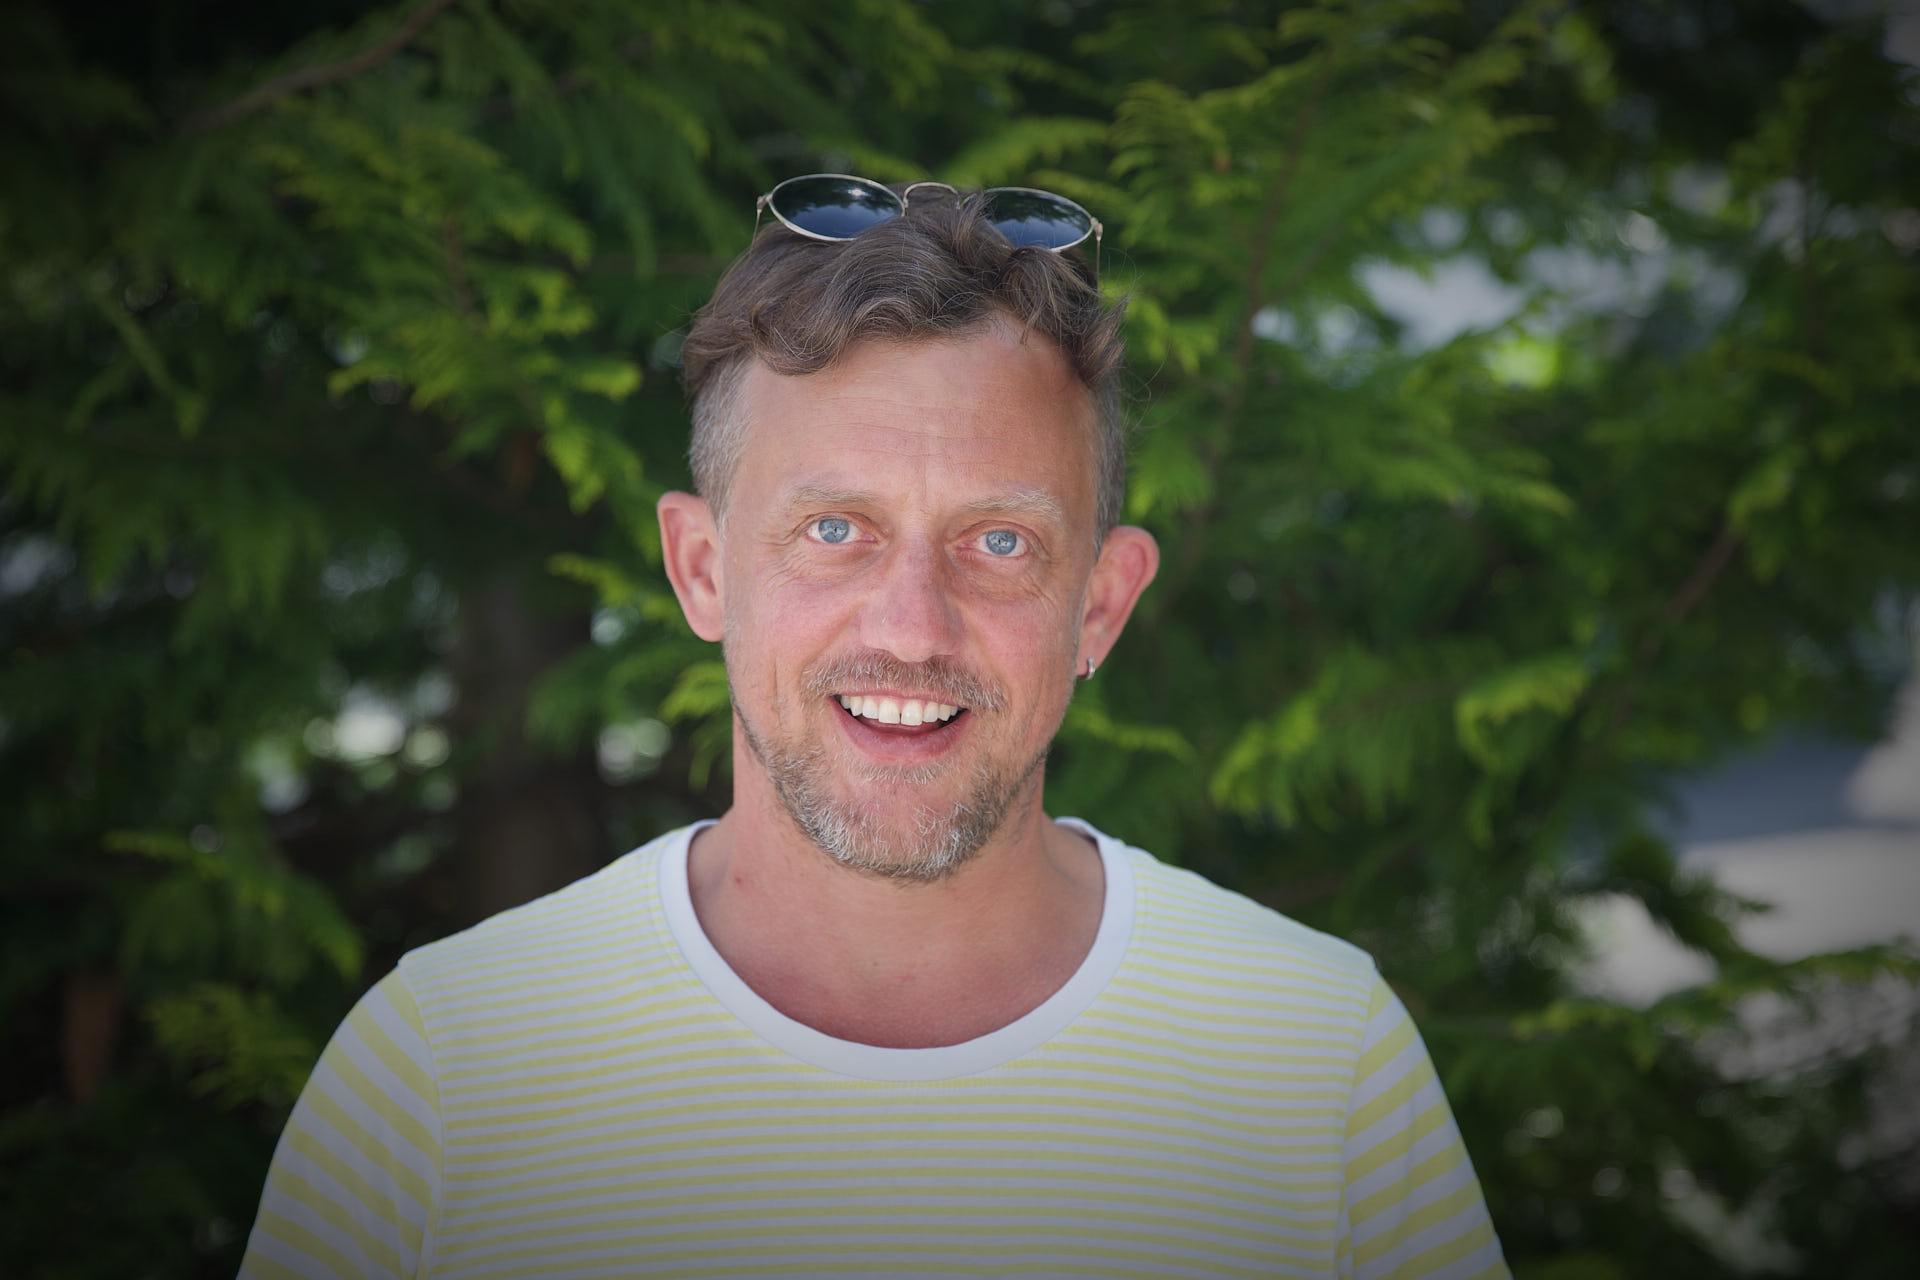 Peter Olibet